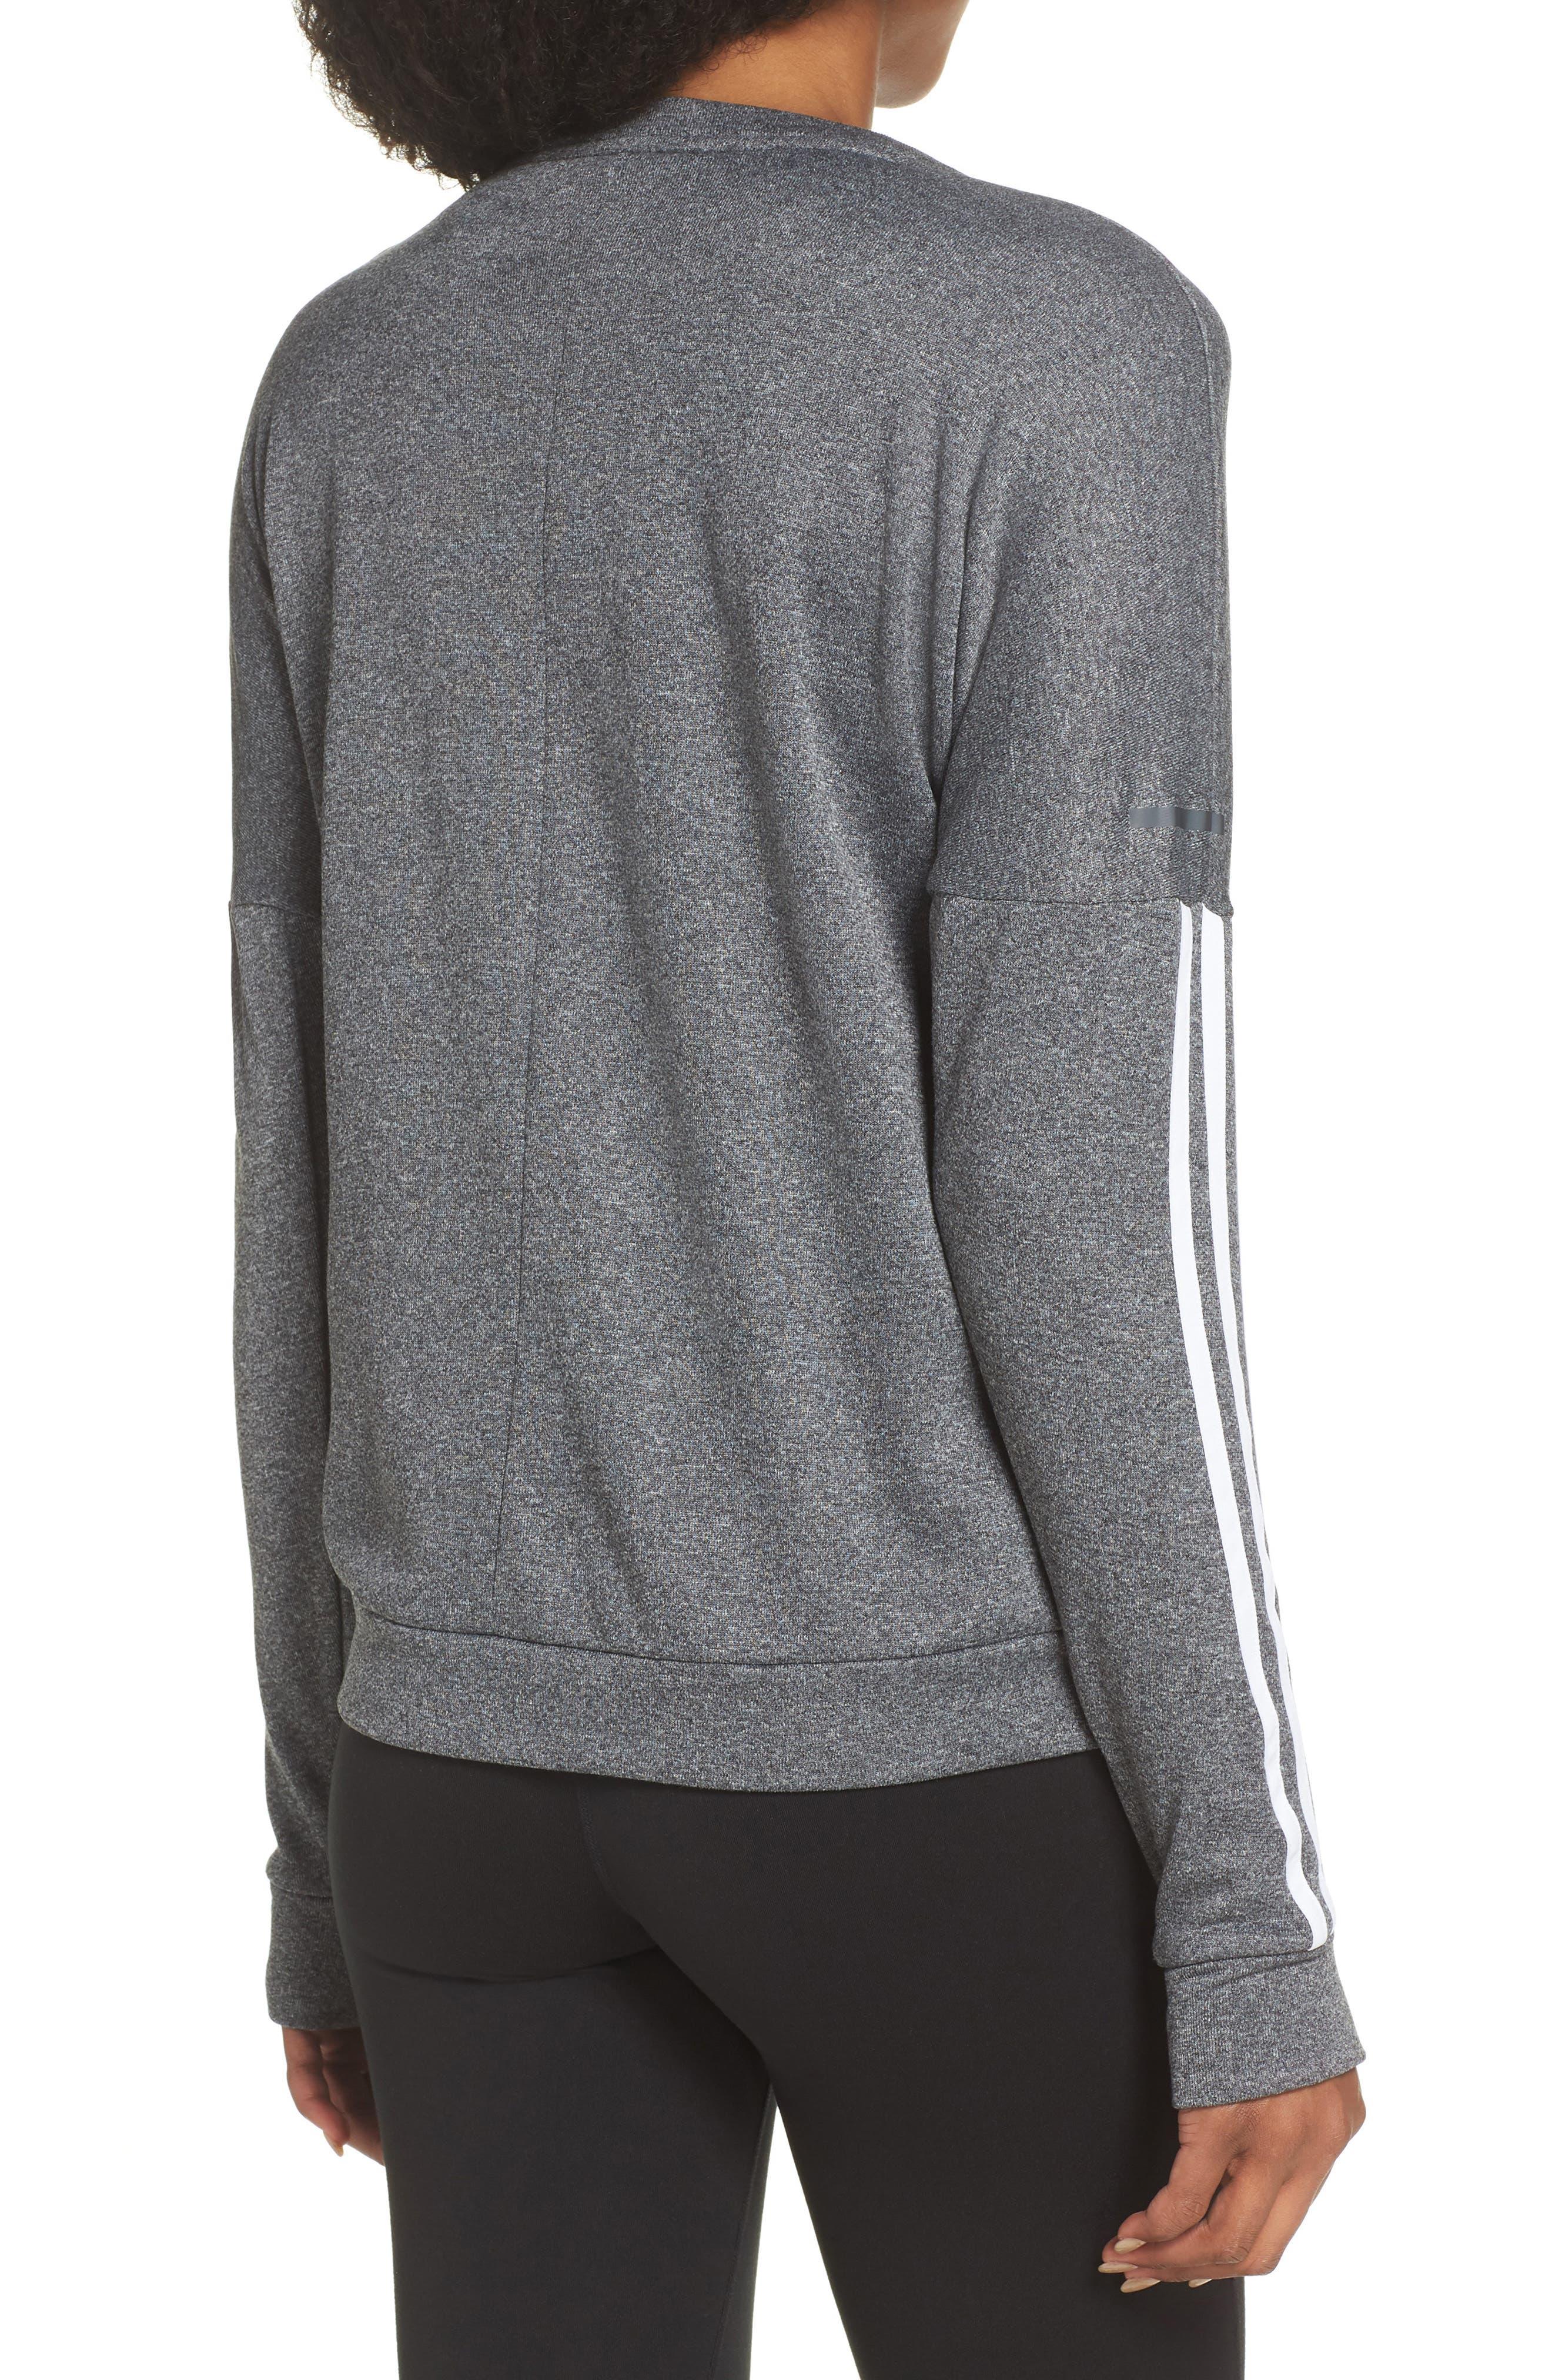 3-Stripes Running Sweatshirt,                             Alternate thumbnail 2, color,                             DARK GREY HEATHER